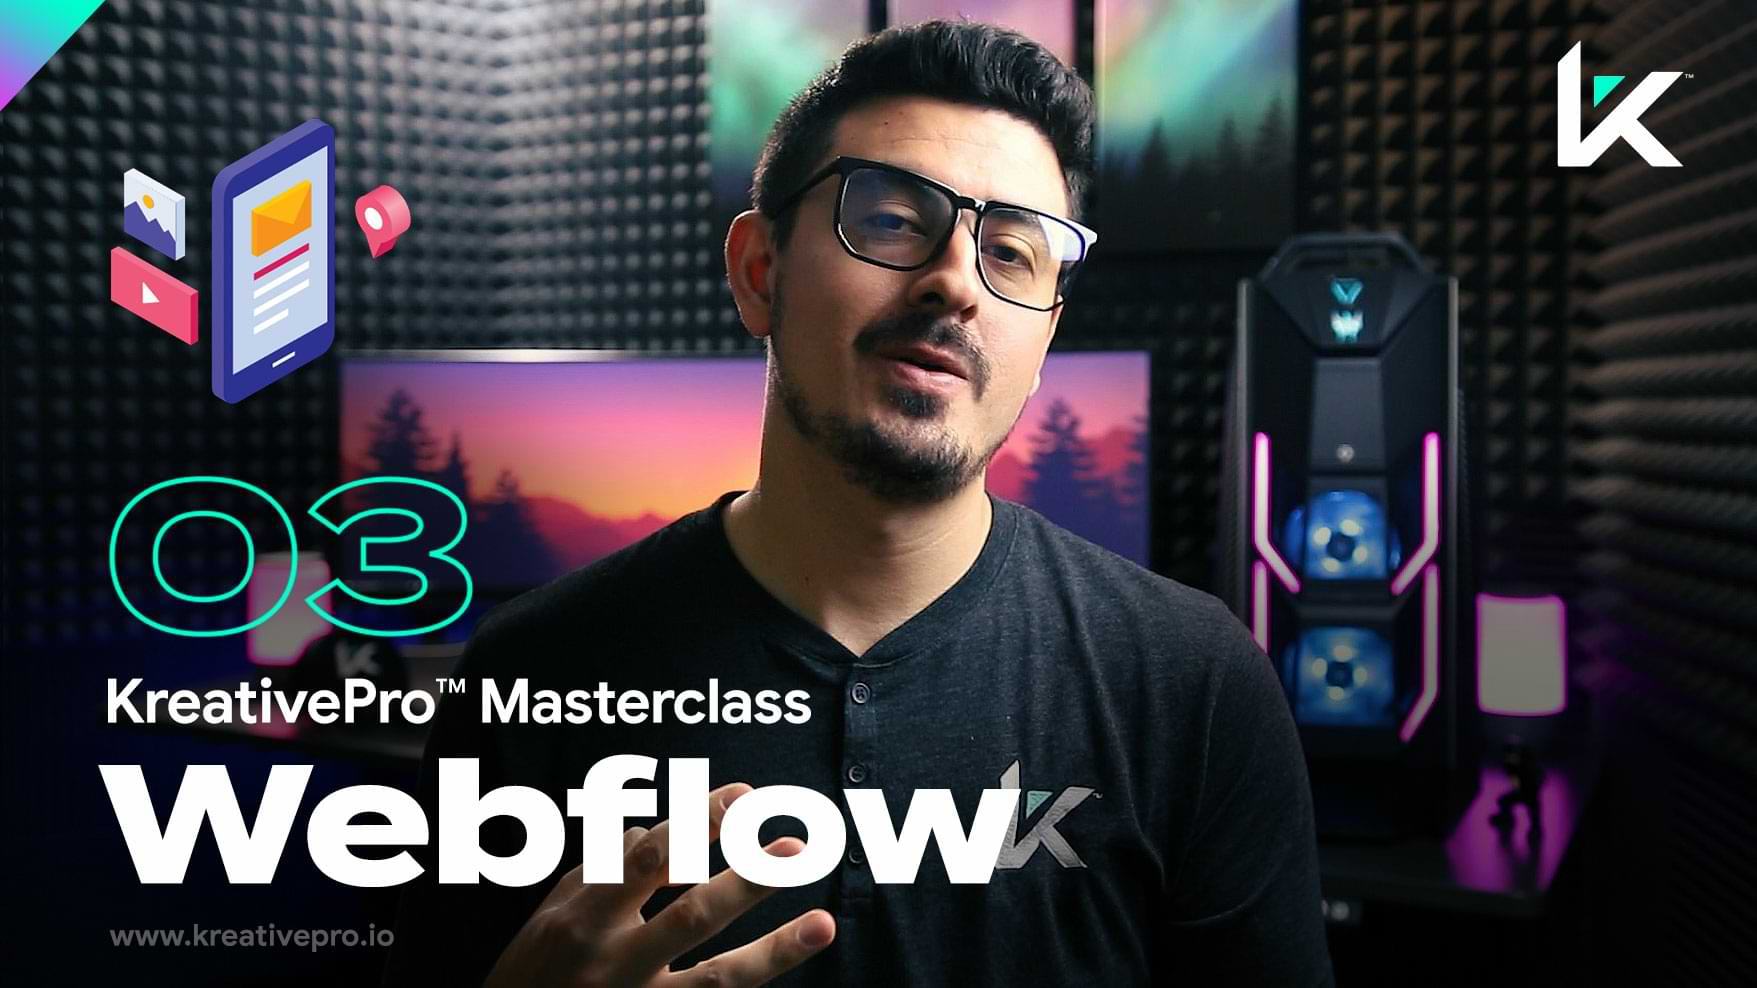 Webflow Masterclass